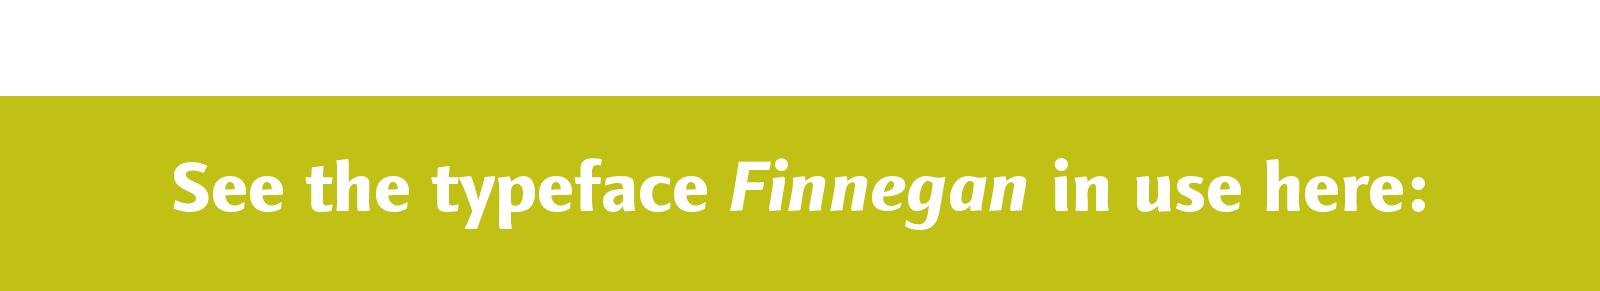 Finnegan in use